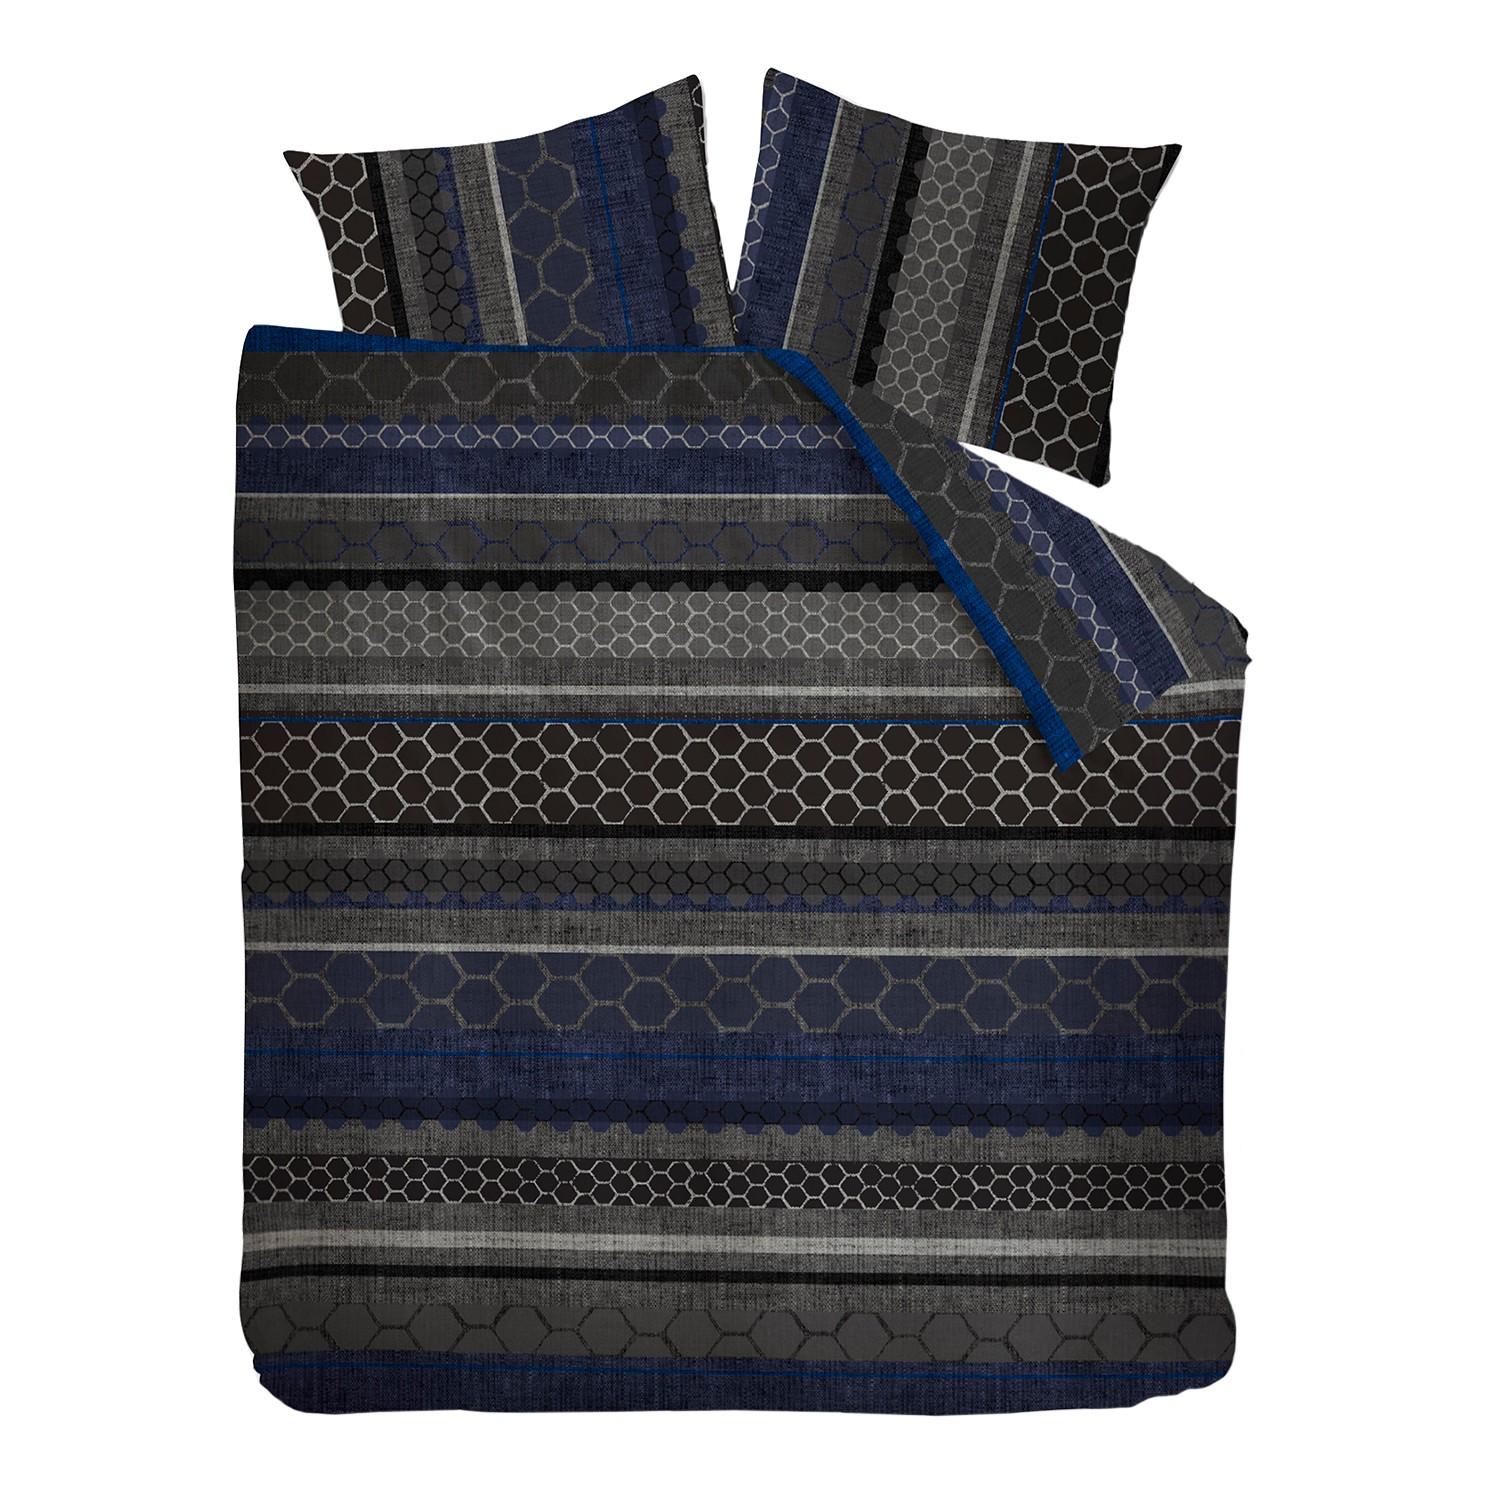 Beddengoed Glade - katoen - Donkergrijs/royal blue - 200x220cm + 2 kussens 80x80cm, OILILY